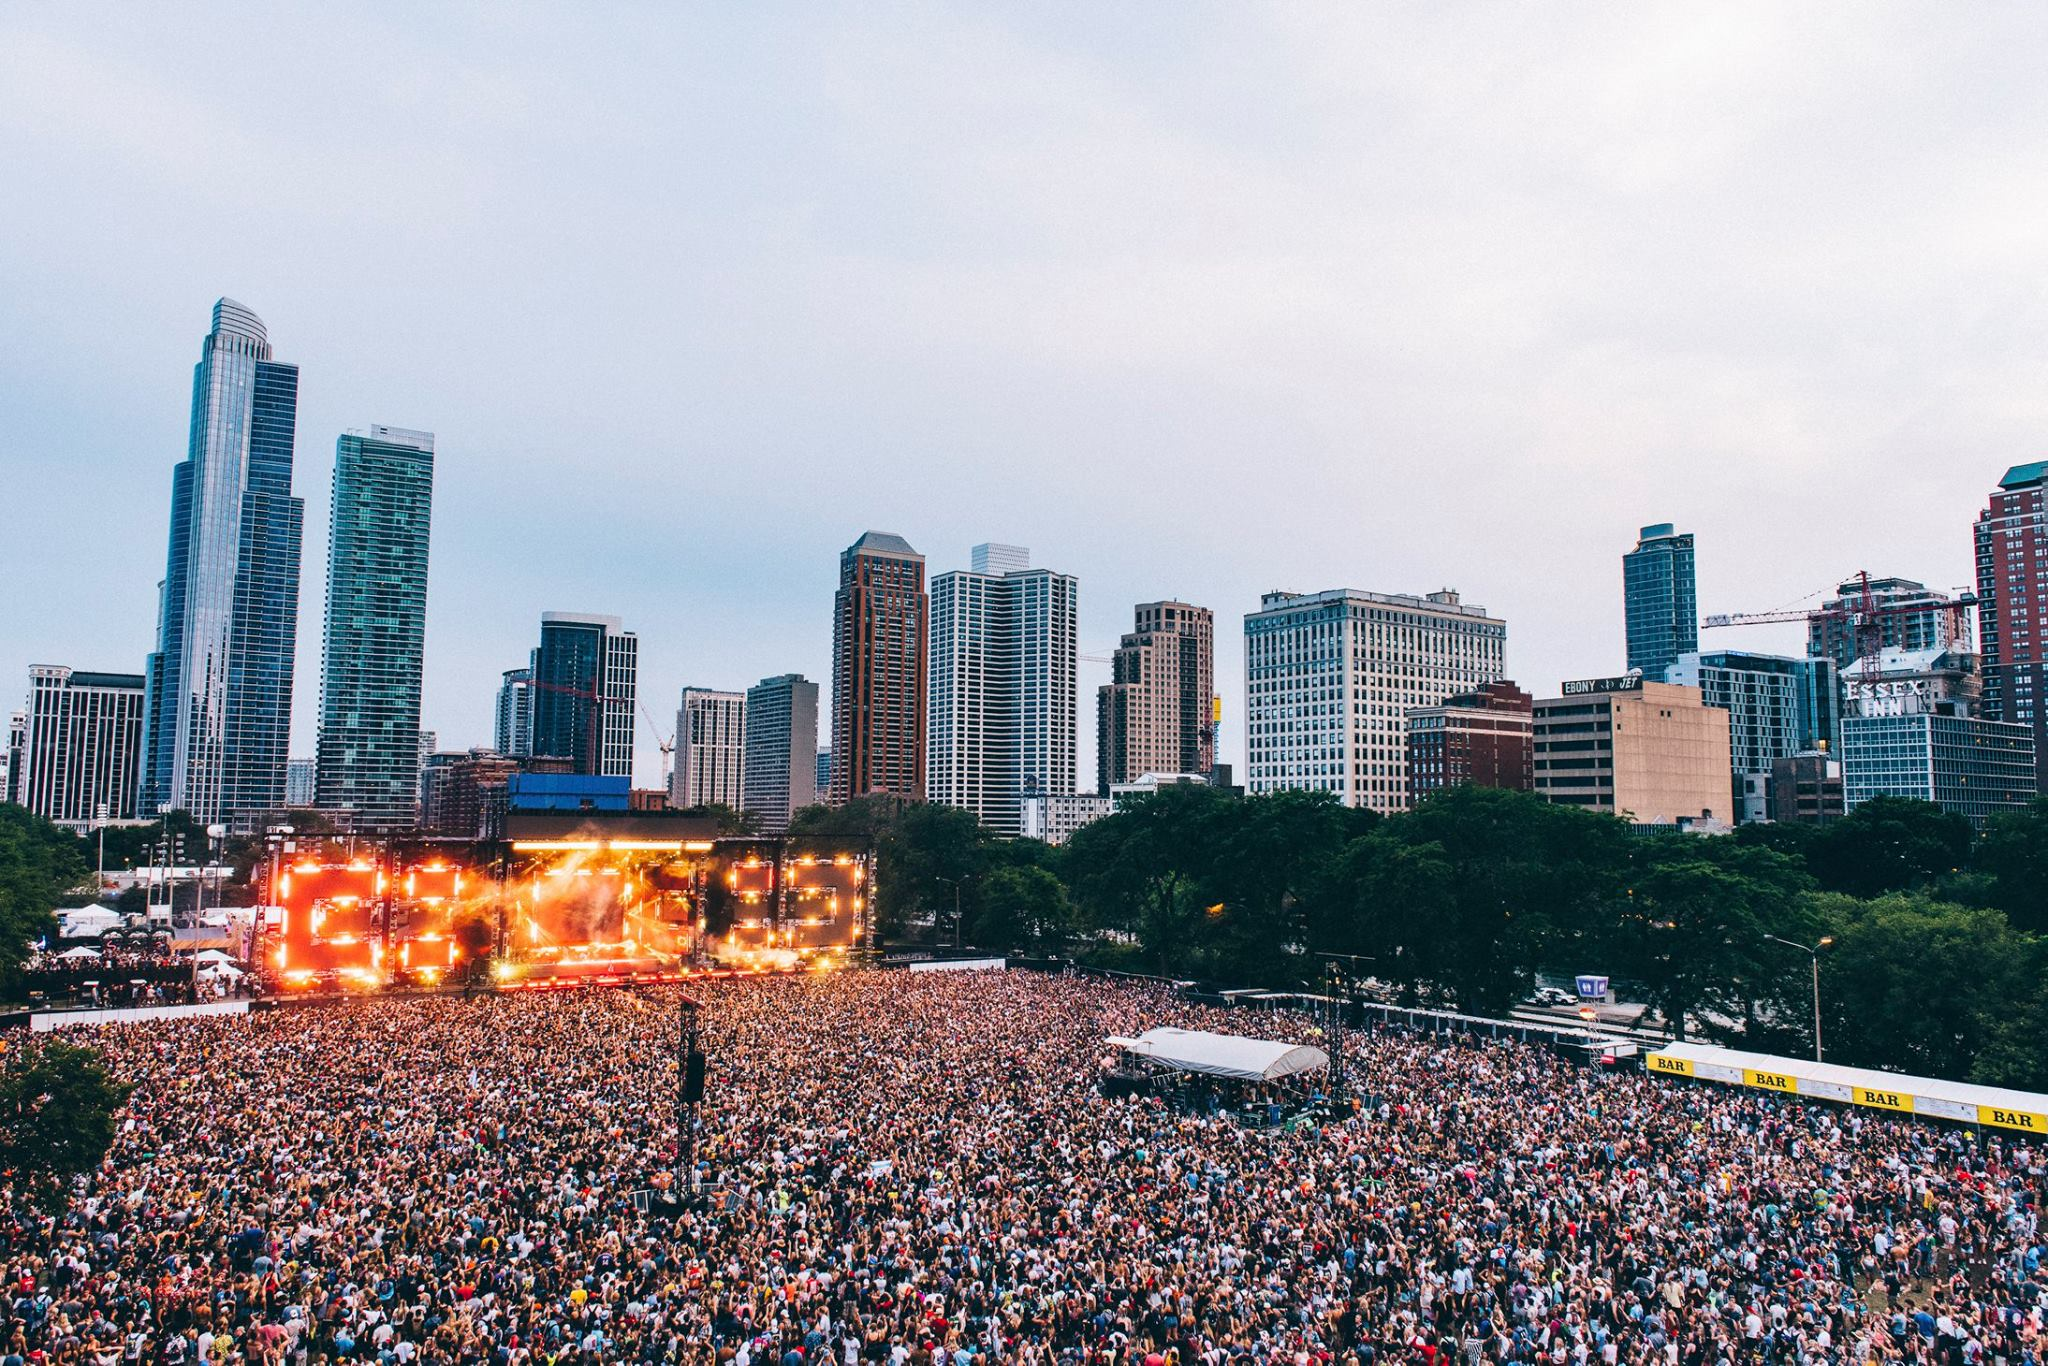 lollapalooza 2018 lineup rumors